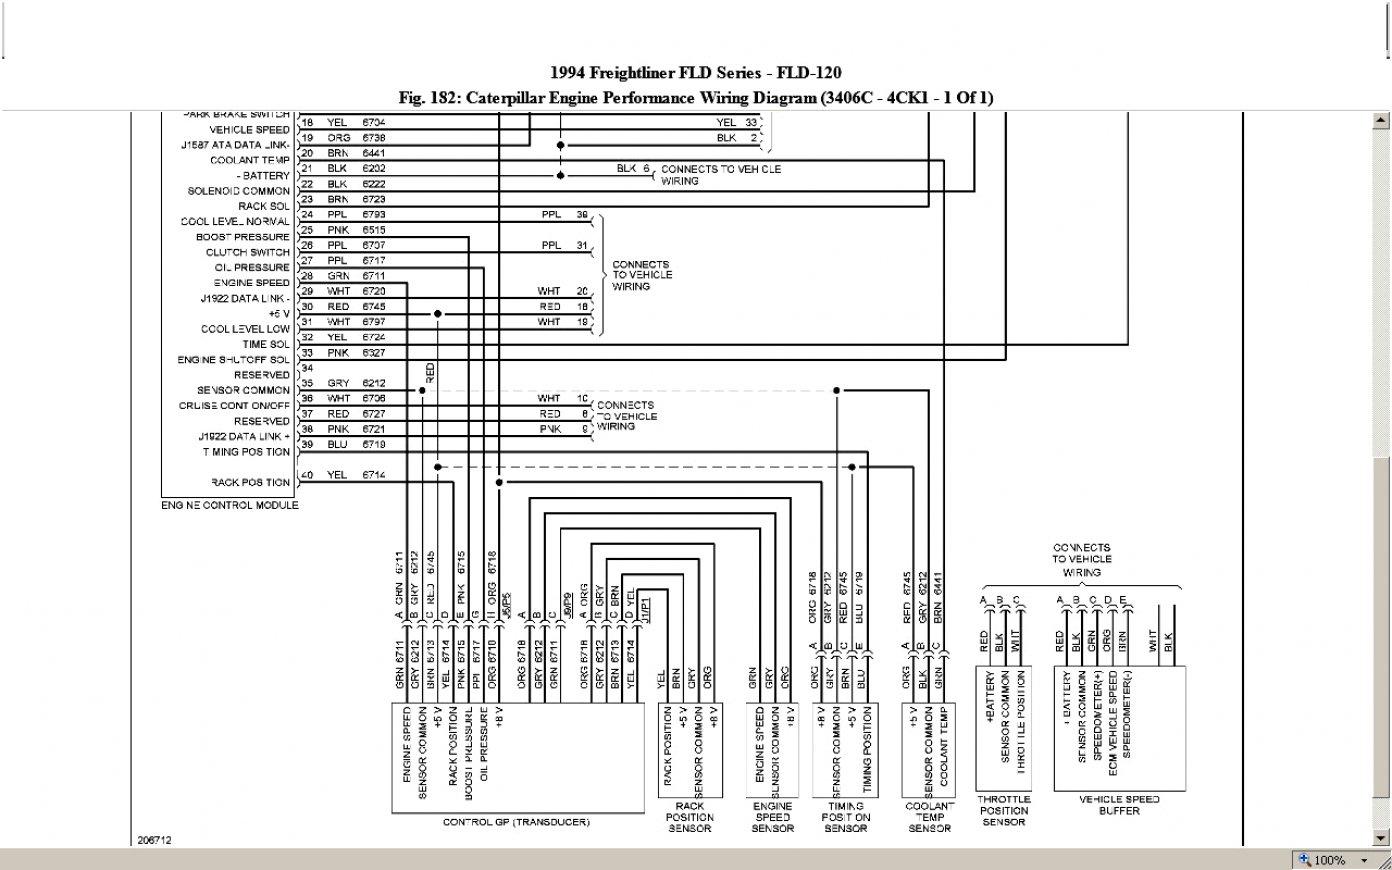 Cat Mxs Ecm Pin Wiring Diagram | Wiring Diagram - Cat 70 Pin Ecm Wiring Diagram